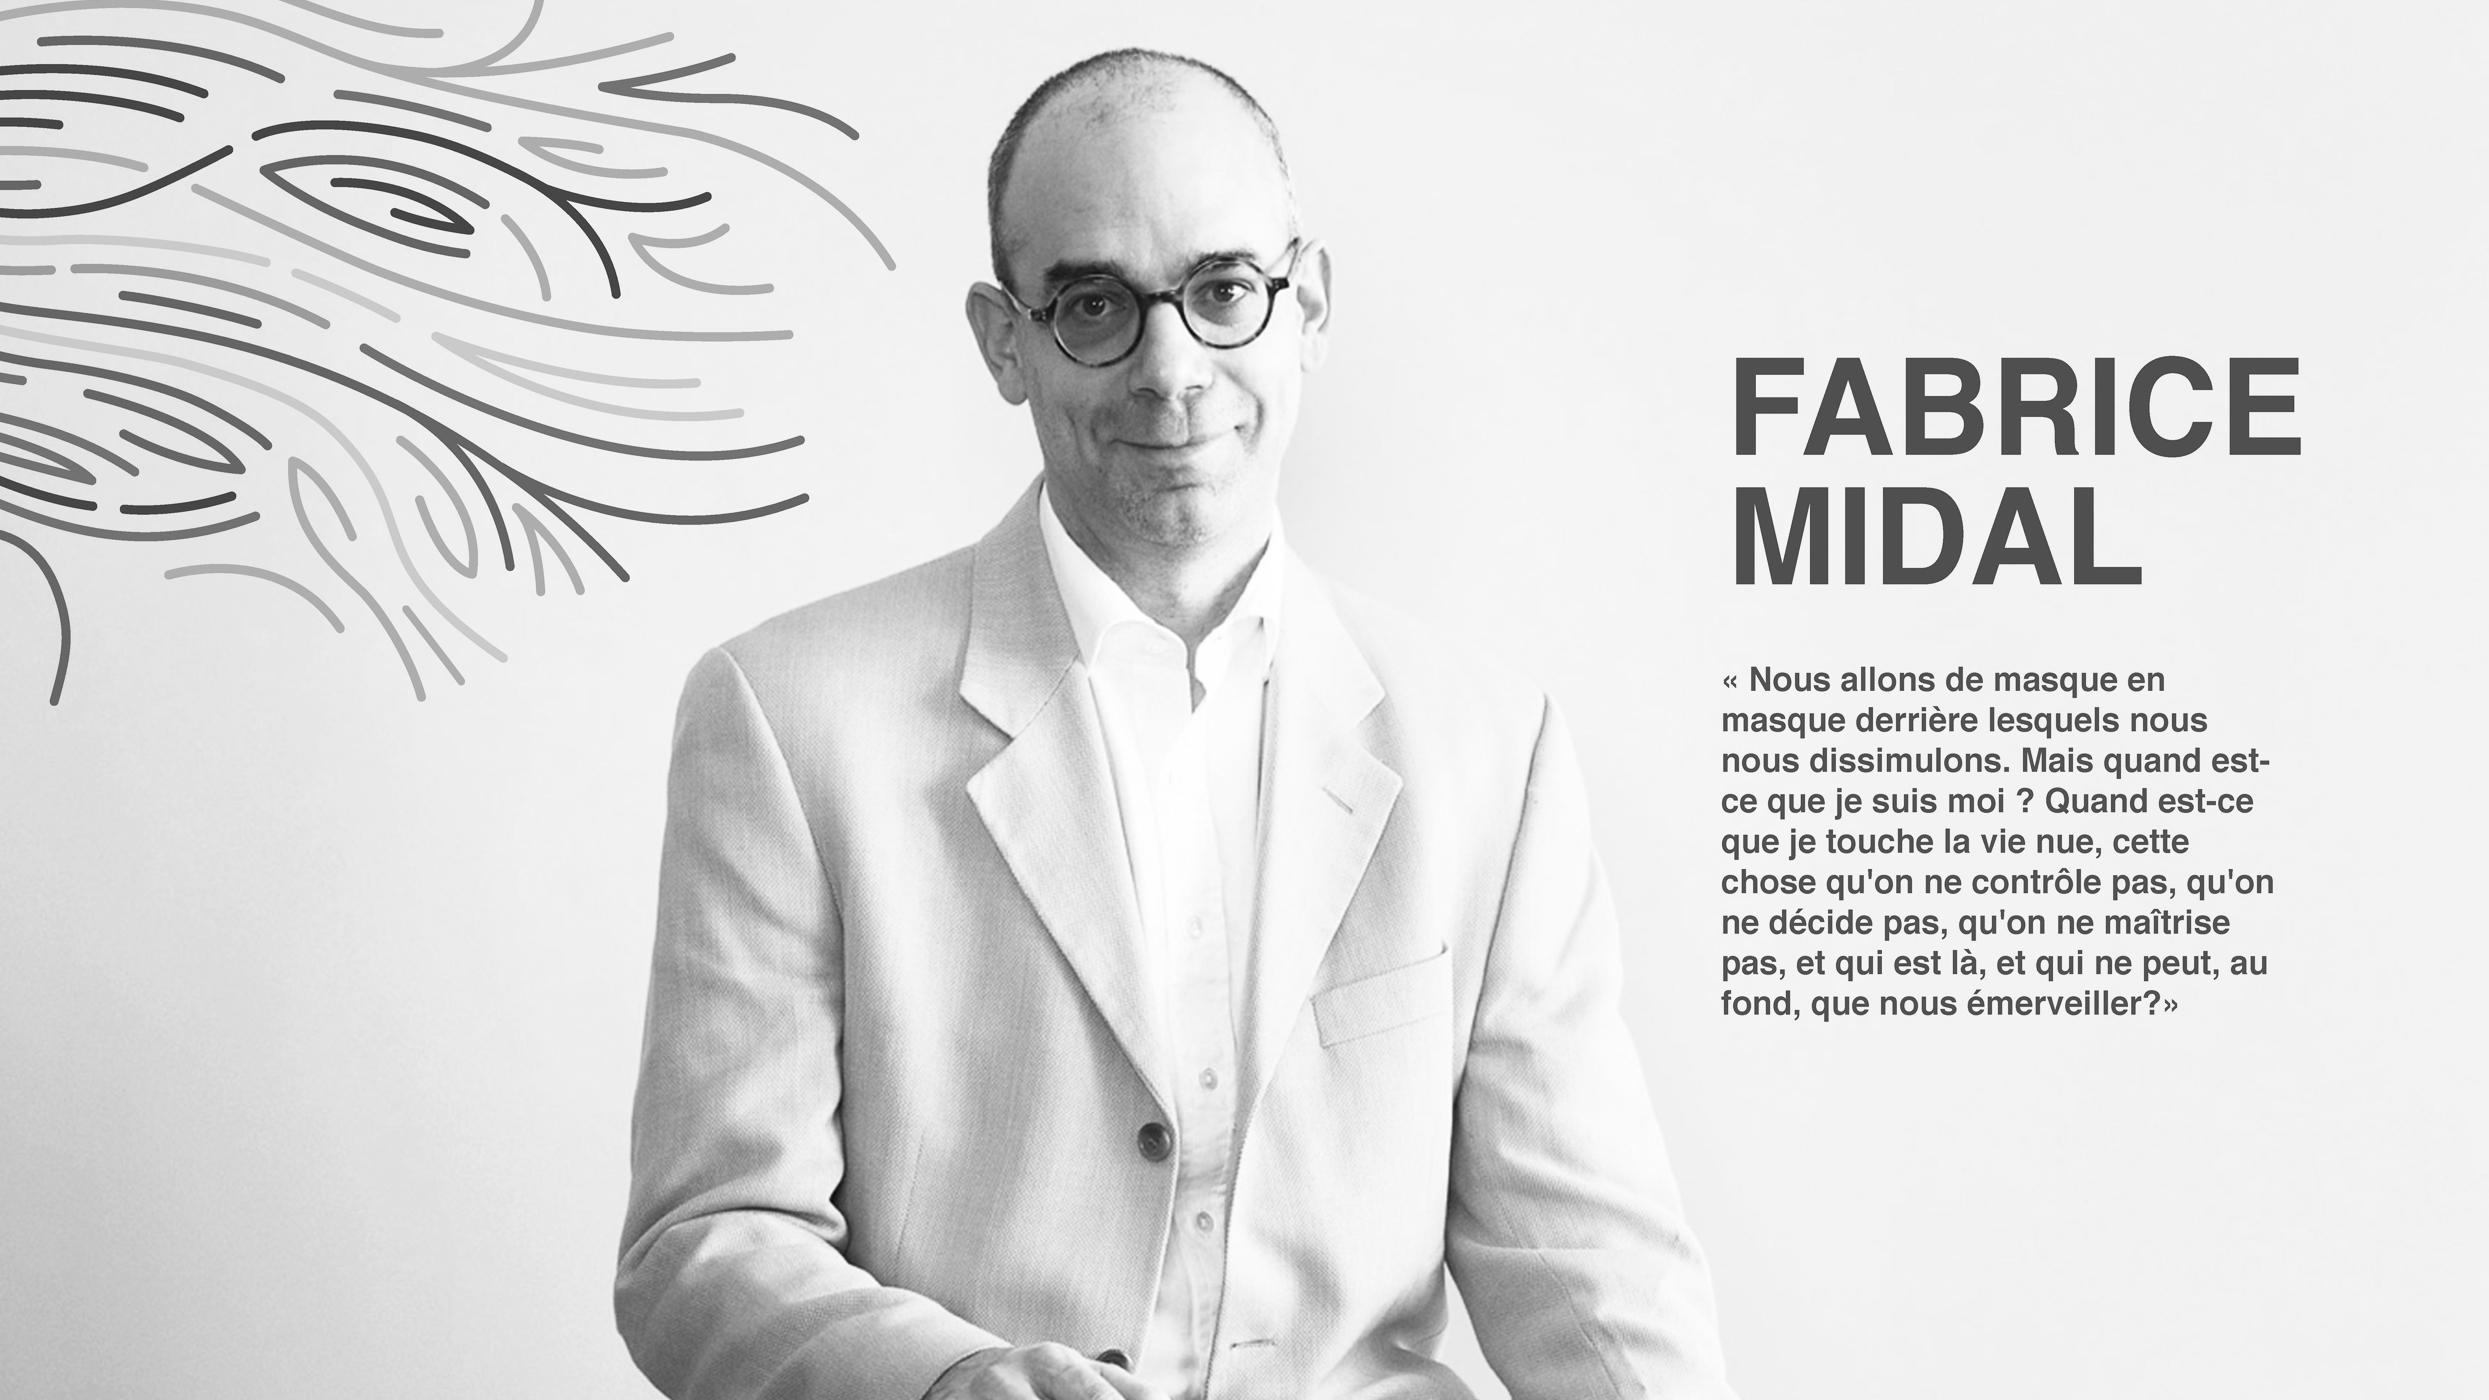 FABRICE MIDAL 14h00